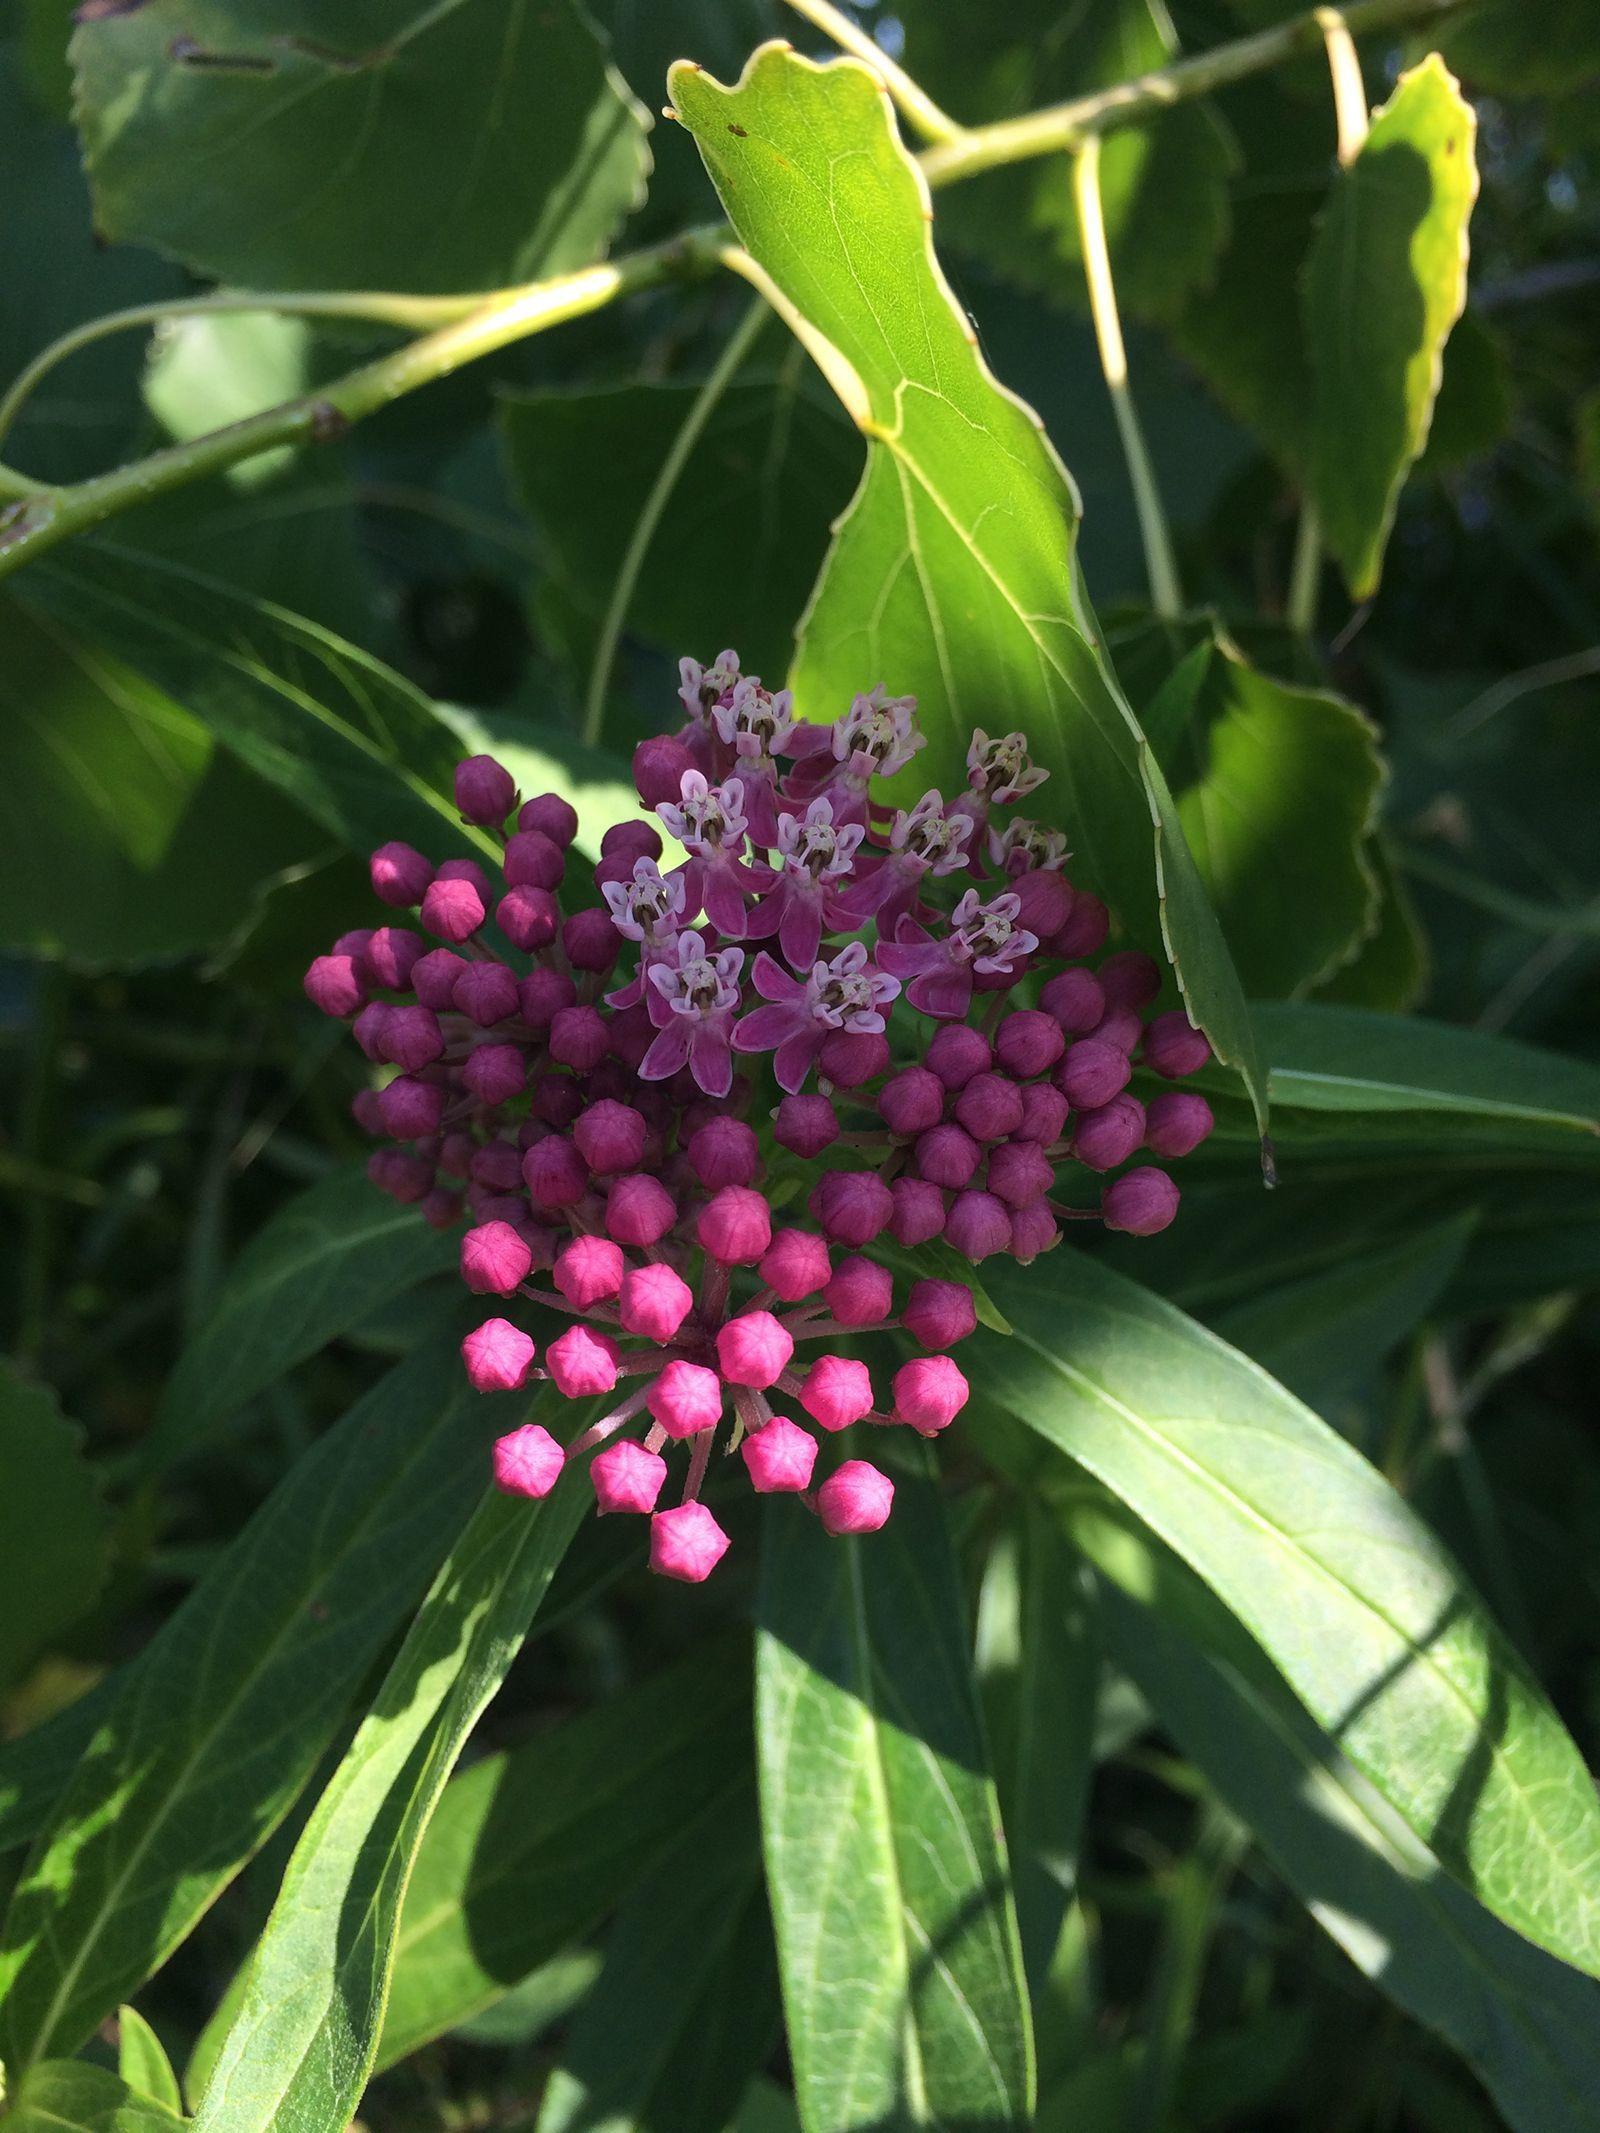 Rosy Milkweed, Asclepias incarnata